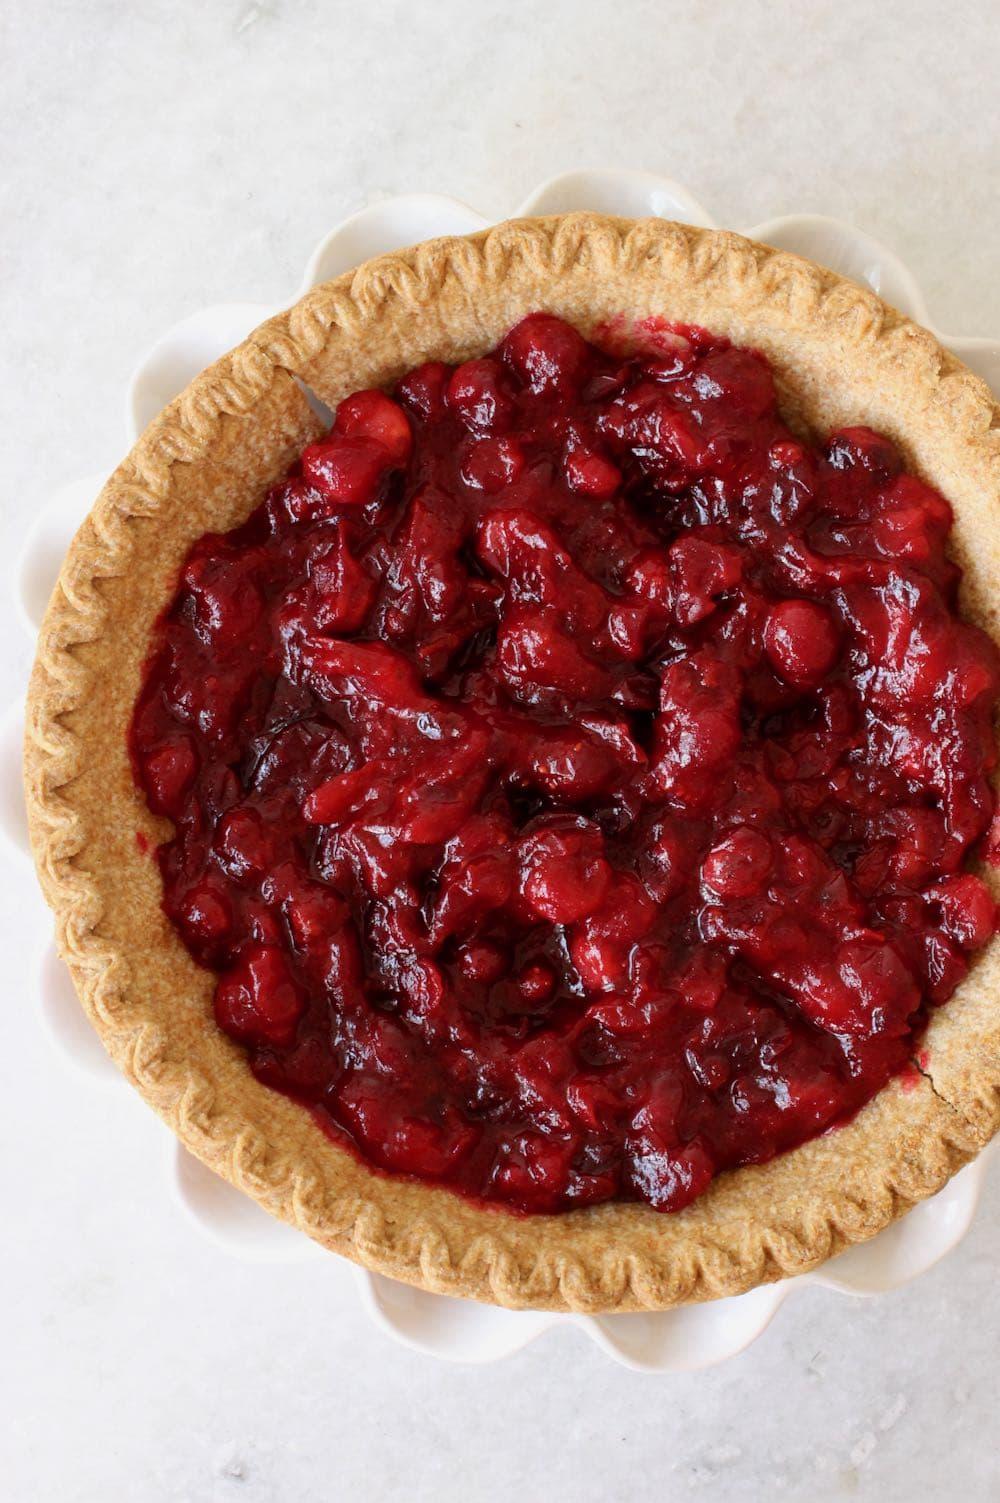 Orange Cranberry Pie Filling